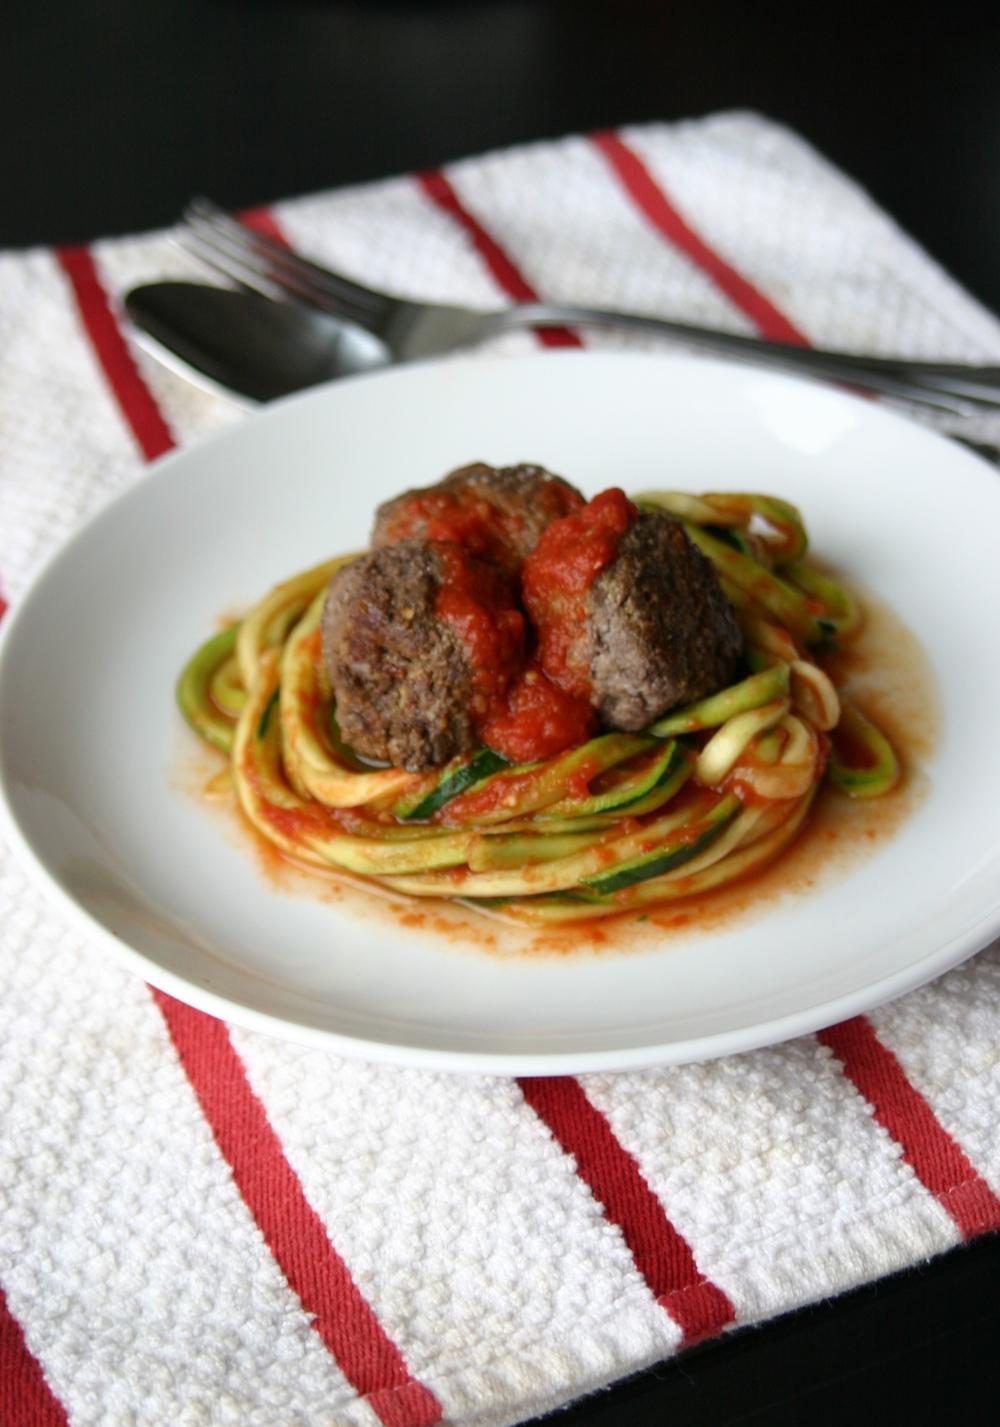 Paleo Spaghetti & Meatballs